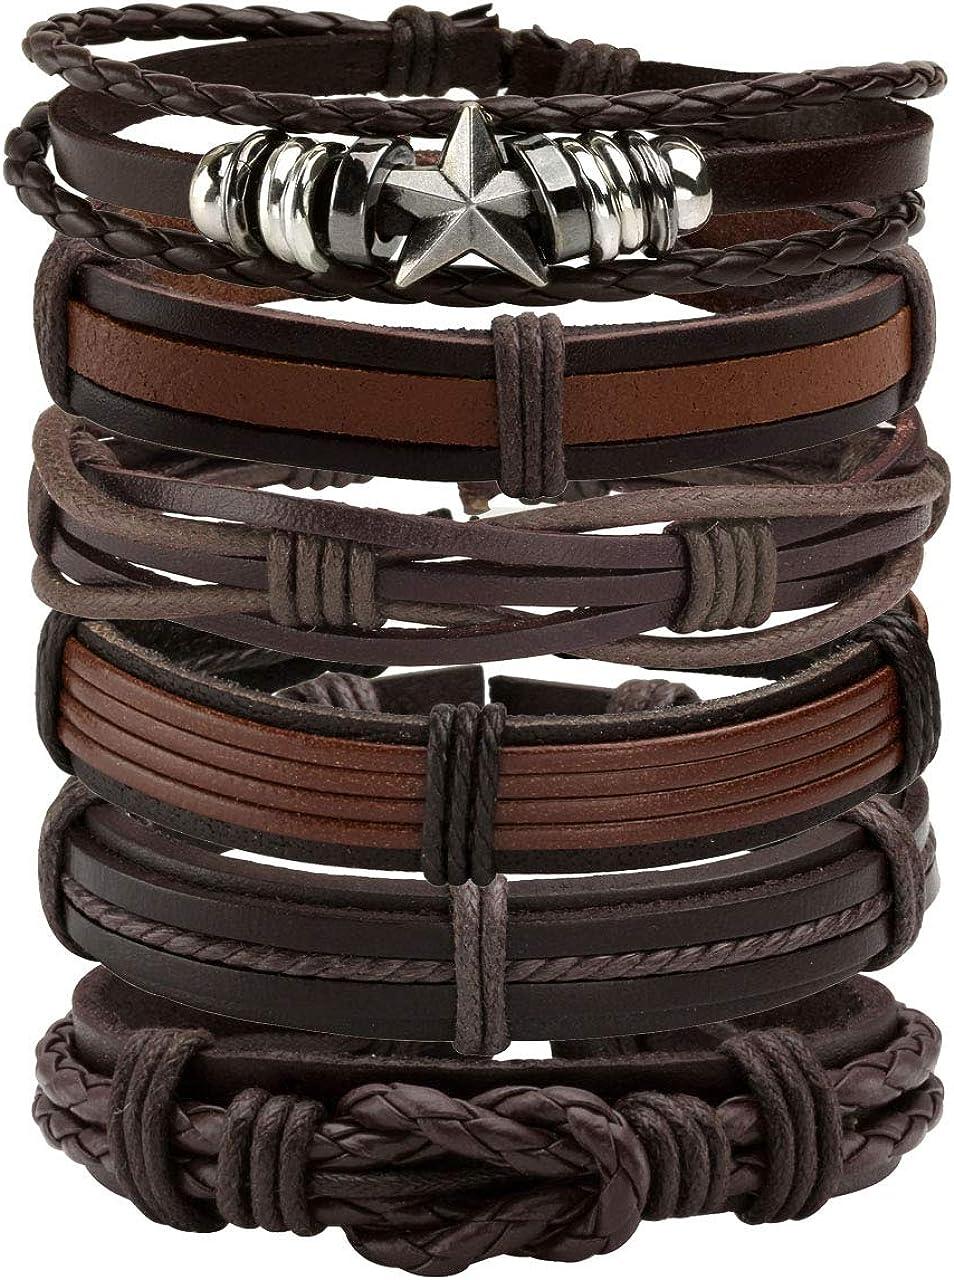 Manfnee Leather Braided Bracelet Cuff Wrap Wristband for Men Women Adjustable